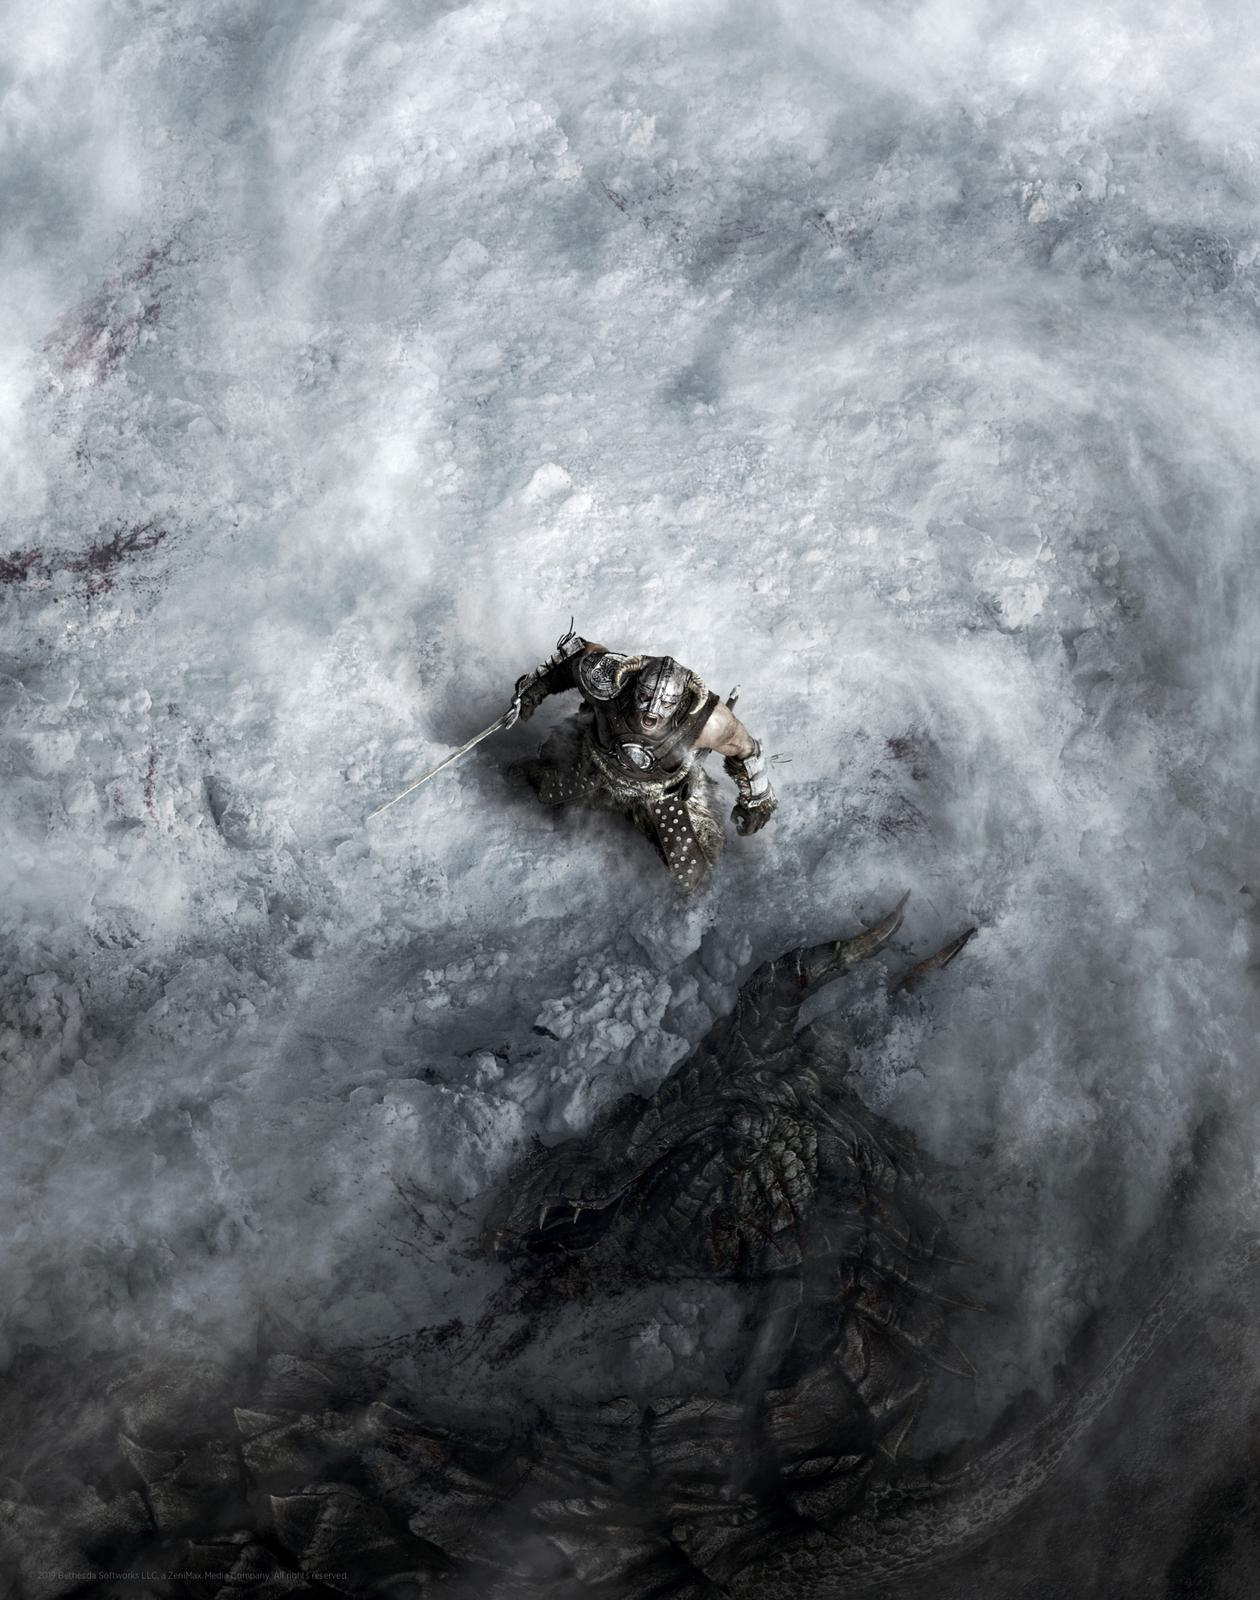 Elder Scrolls: Skyrim - Premium Art Print - Dragon Born image